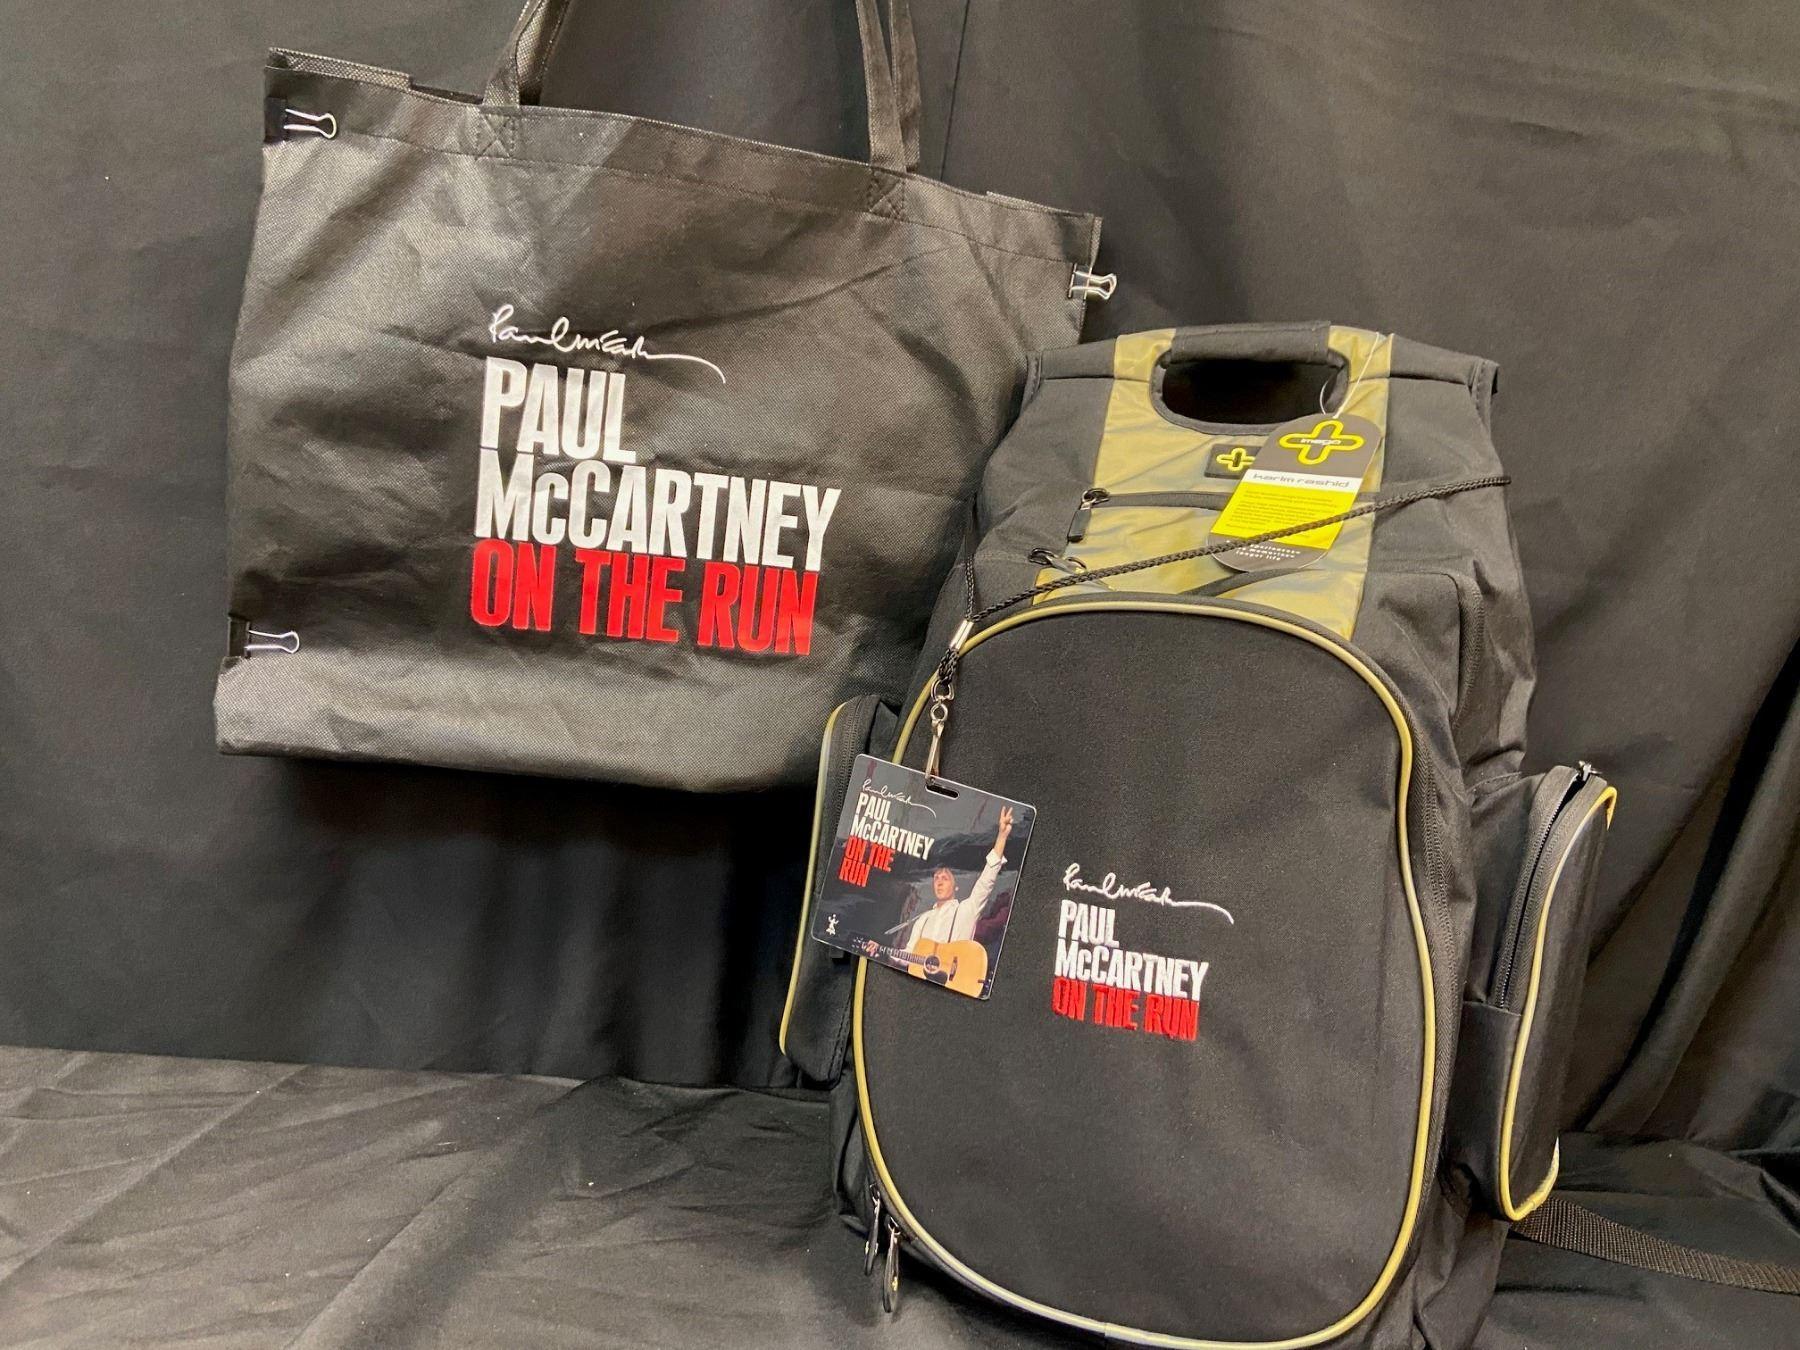 Paul McCartney On the Run Tour VIP Kit